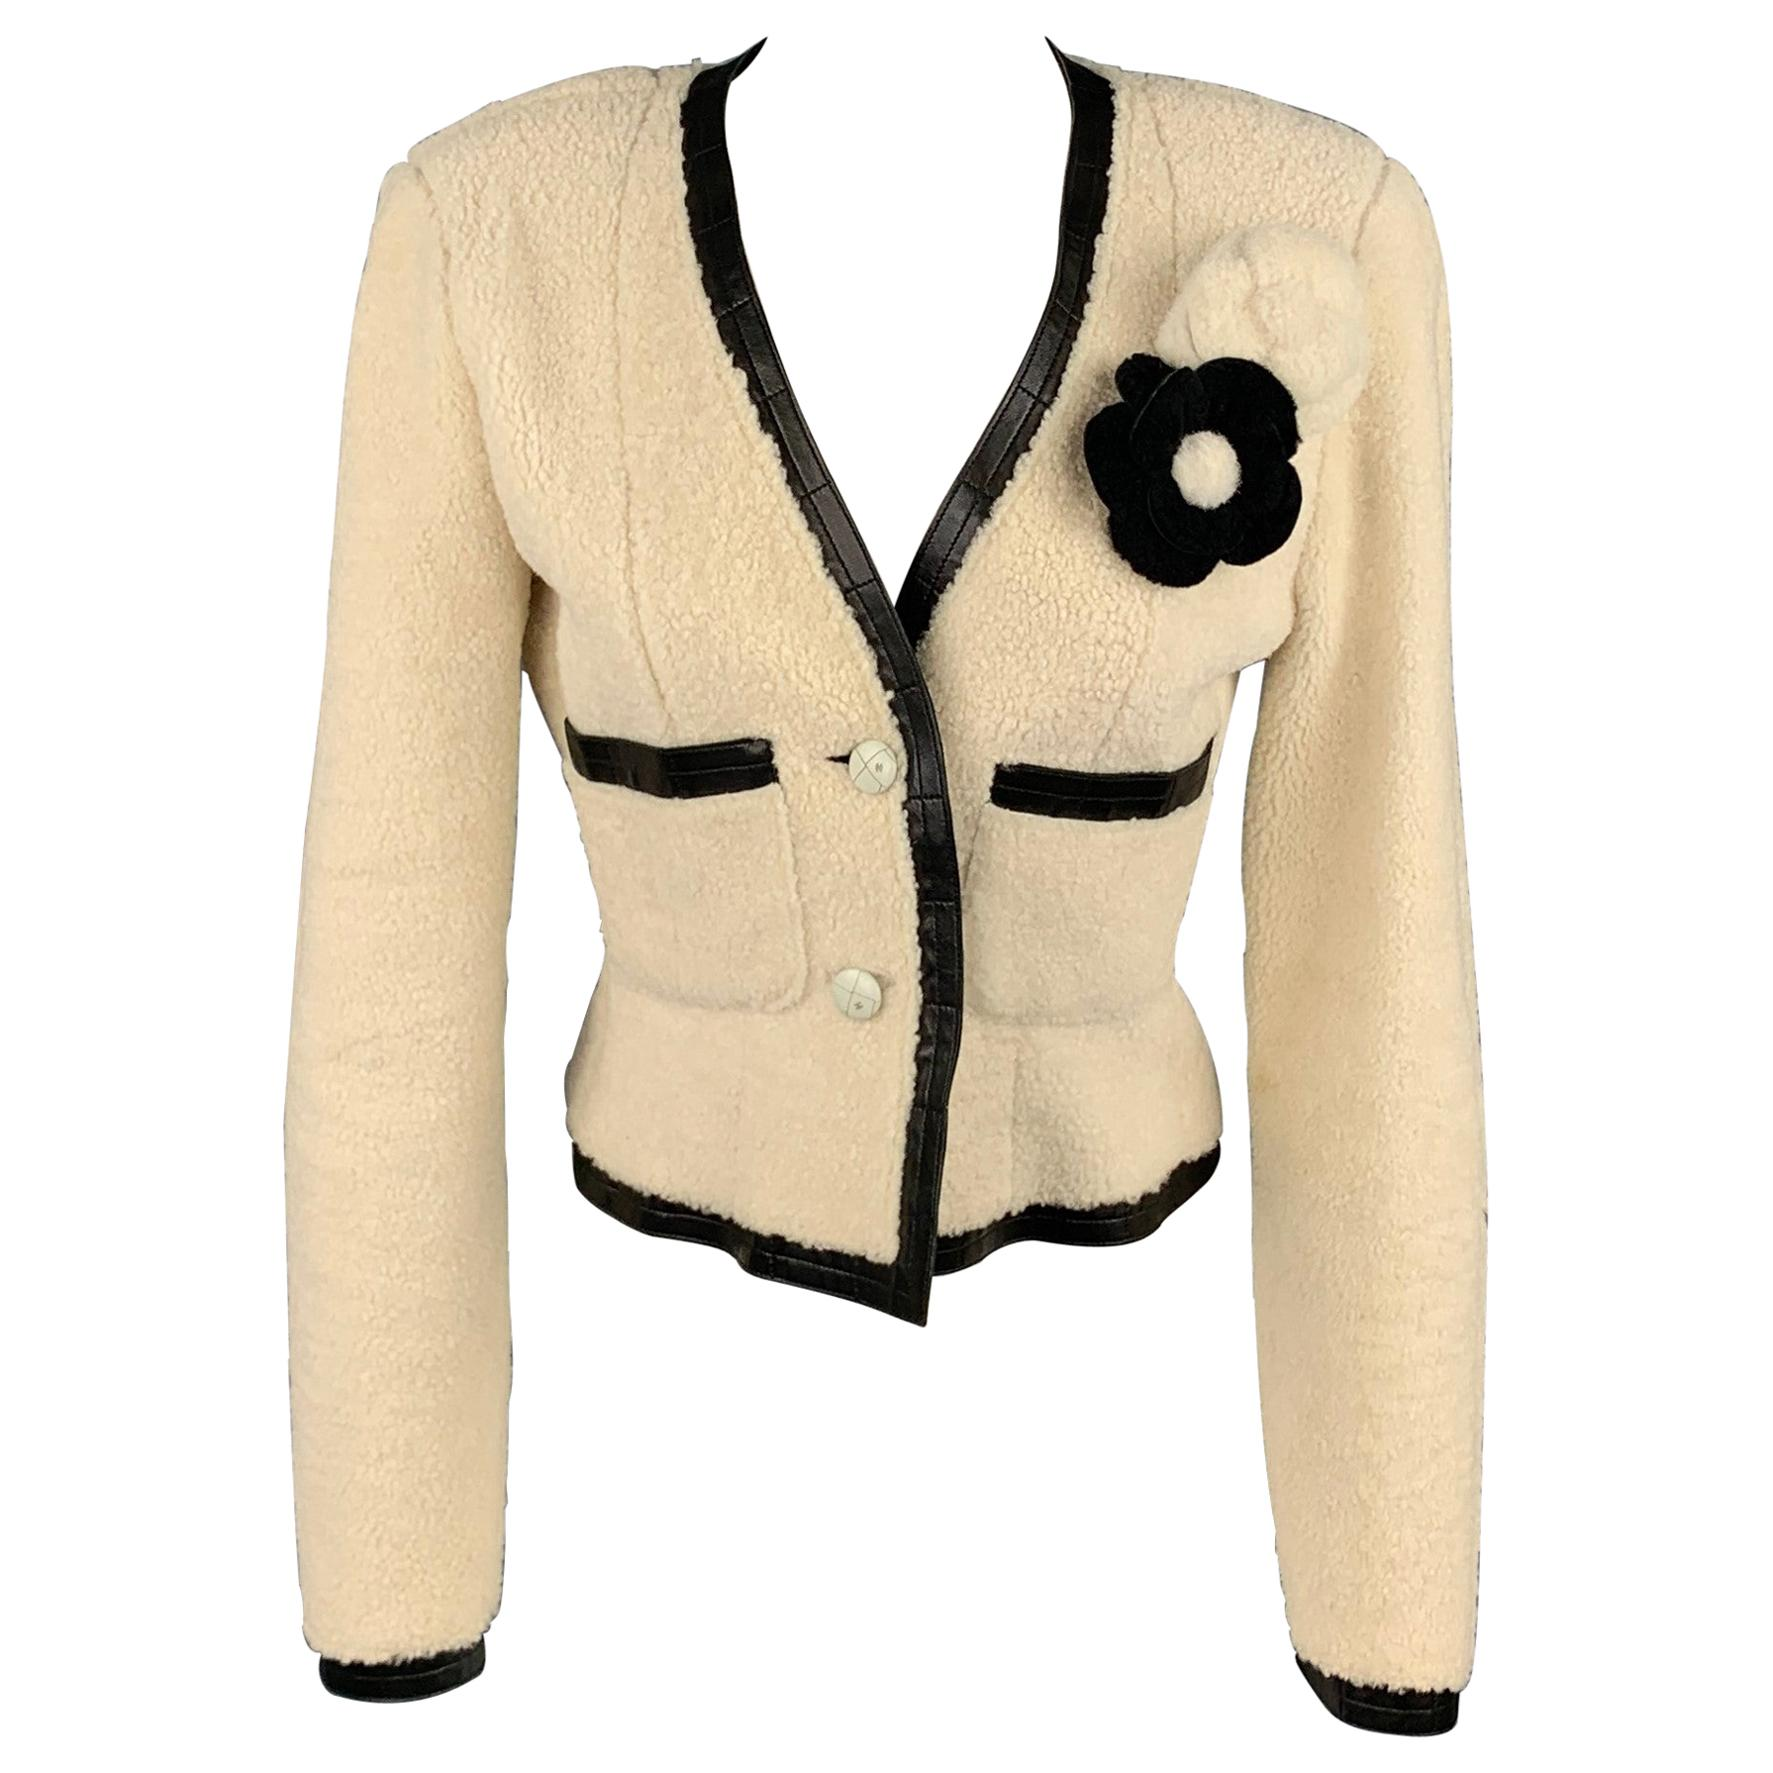 CHANEL 2003 Size 6 Cream & Black Shearling Leather Lamb Skin Jacket